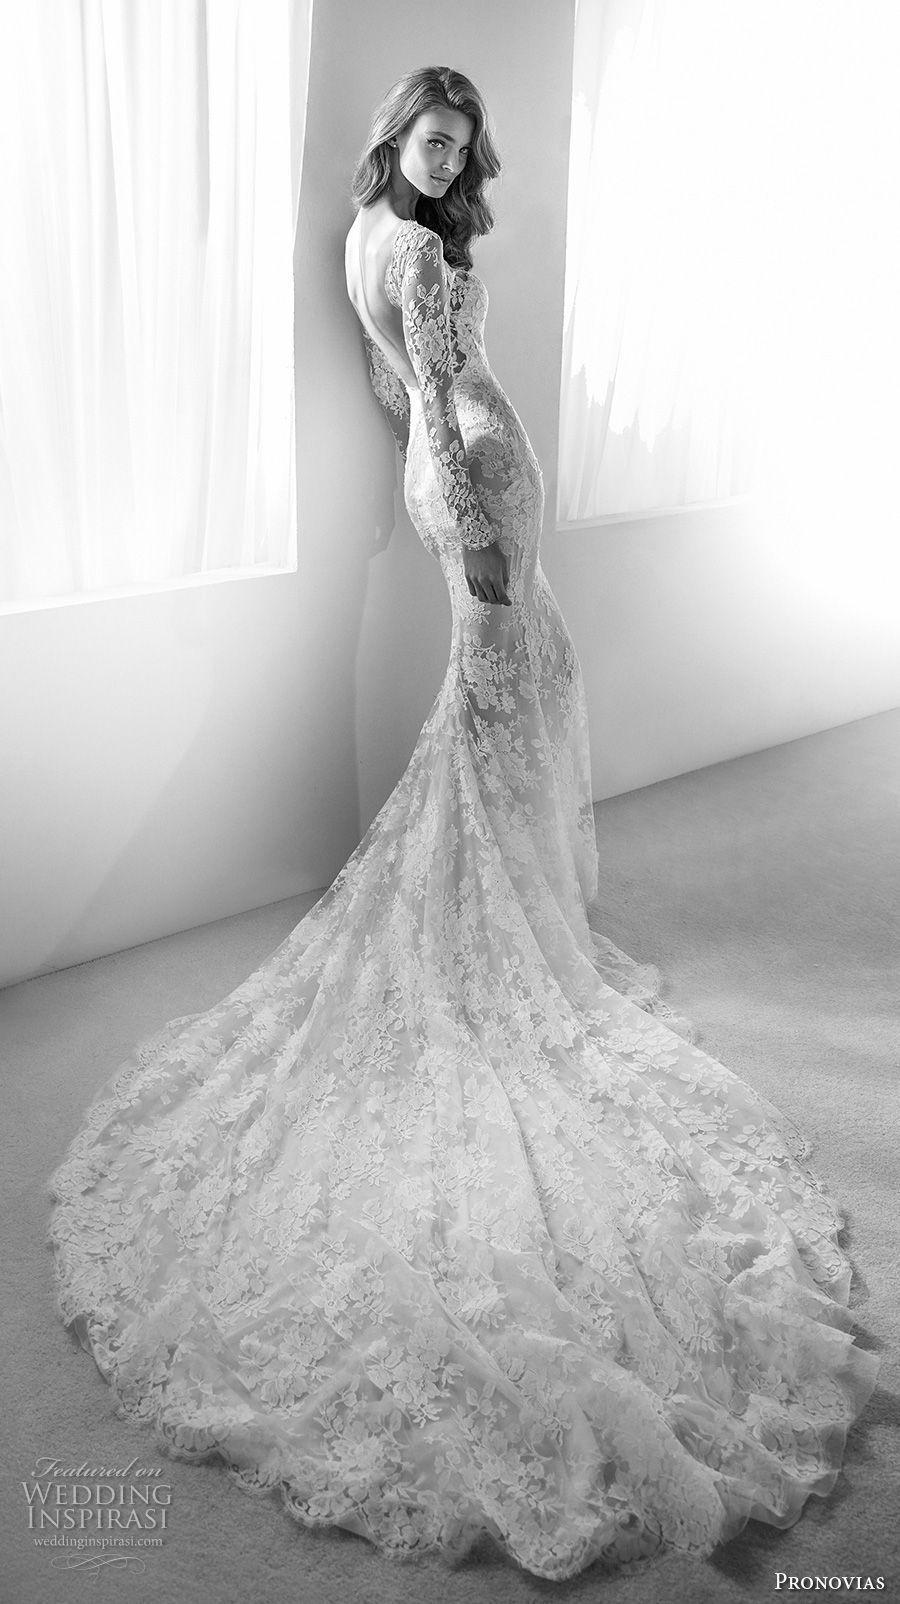 Atelier pronovias bridal long sleeves illusion bateau